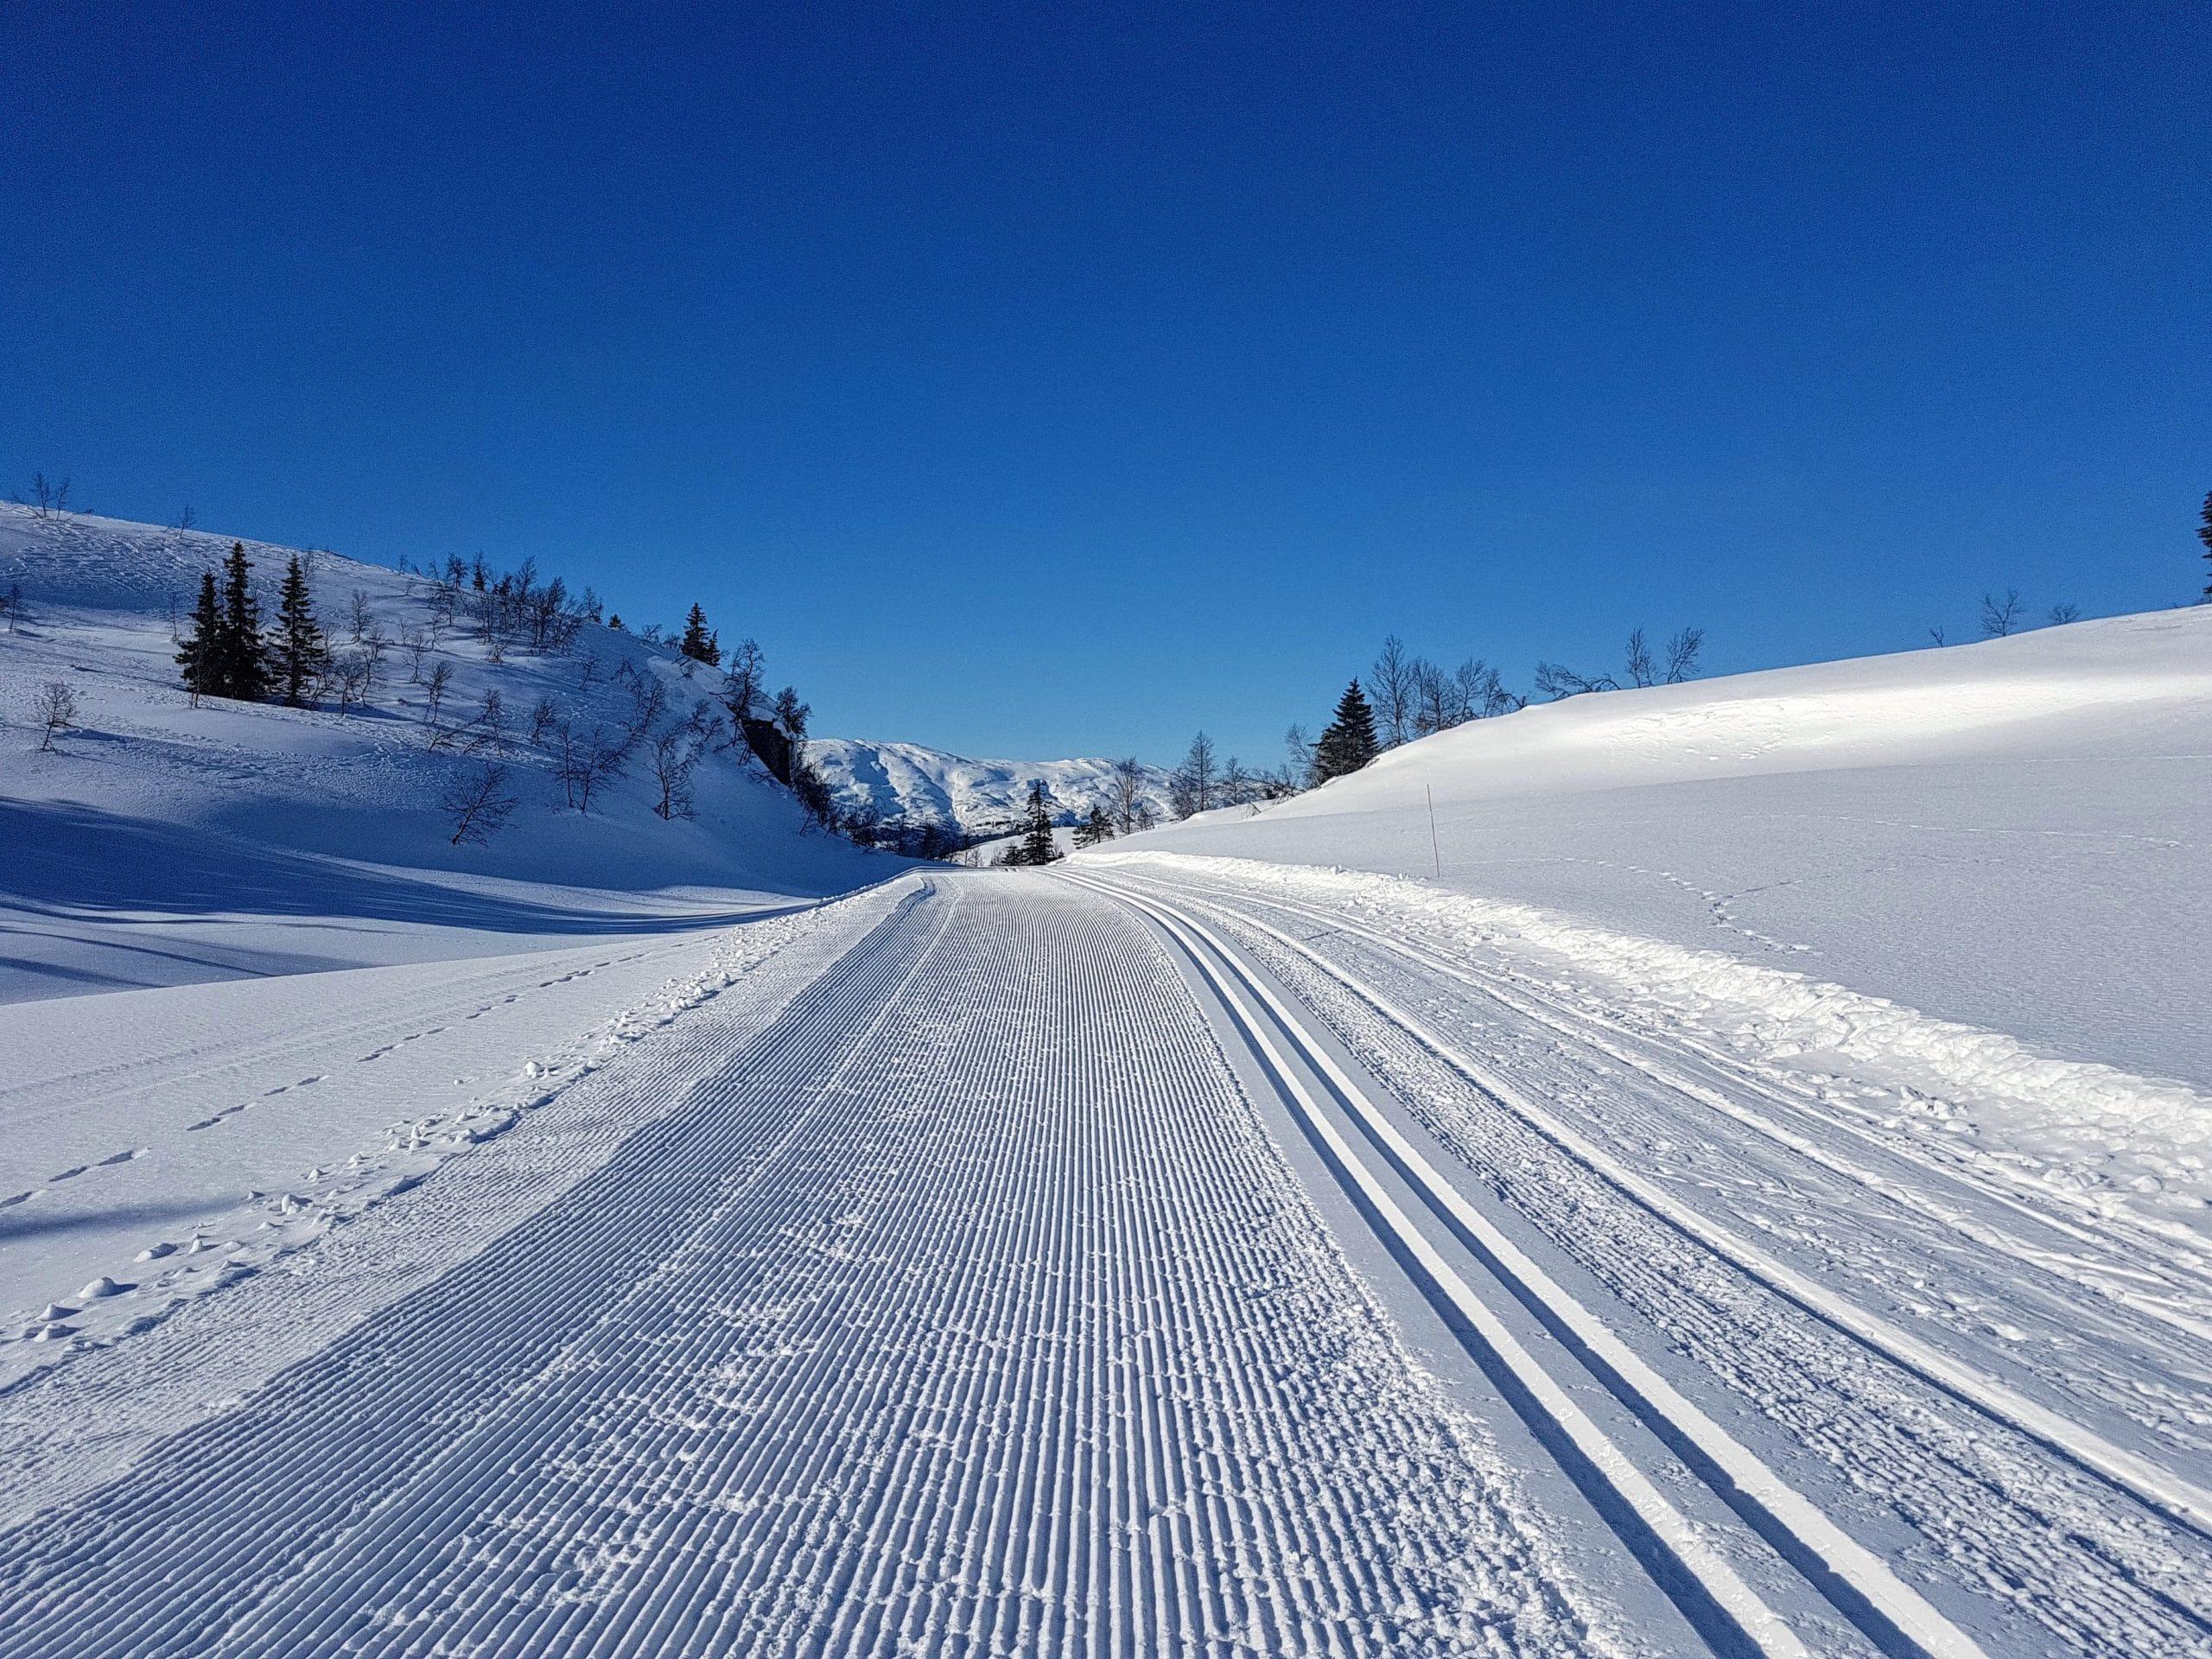 Nordic skitracks